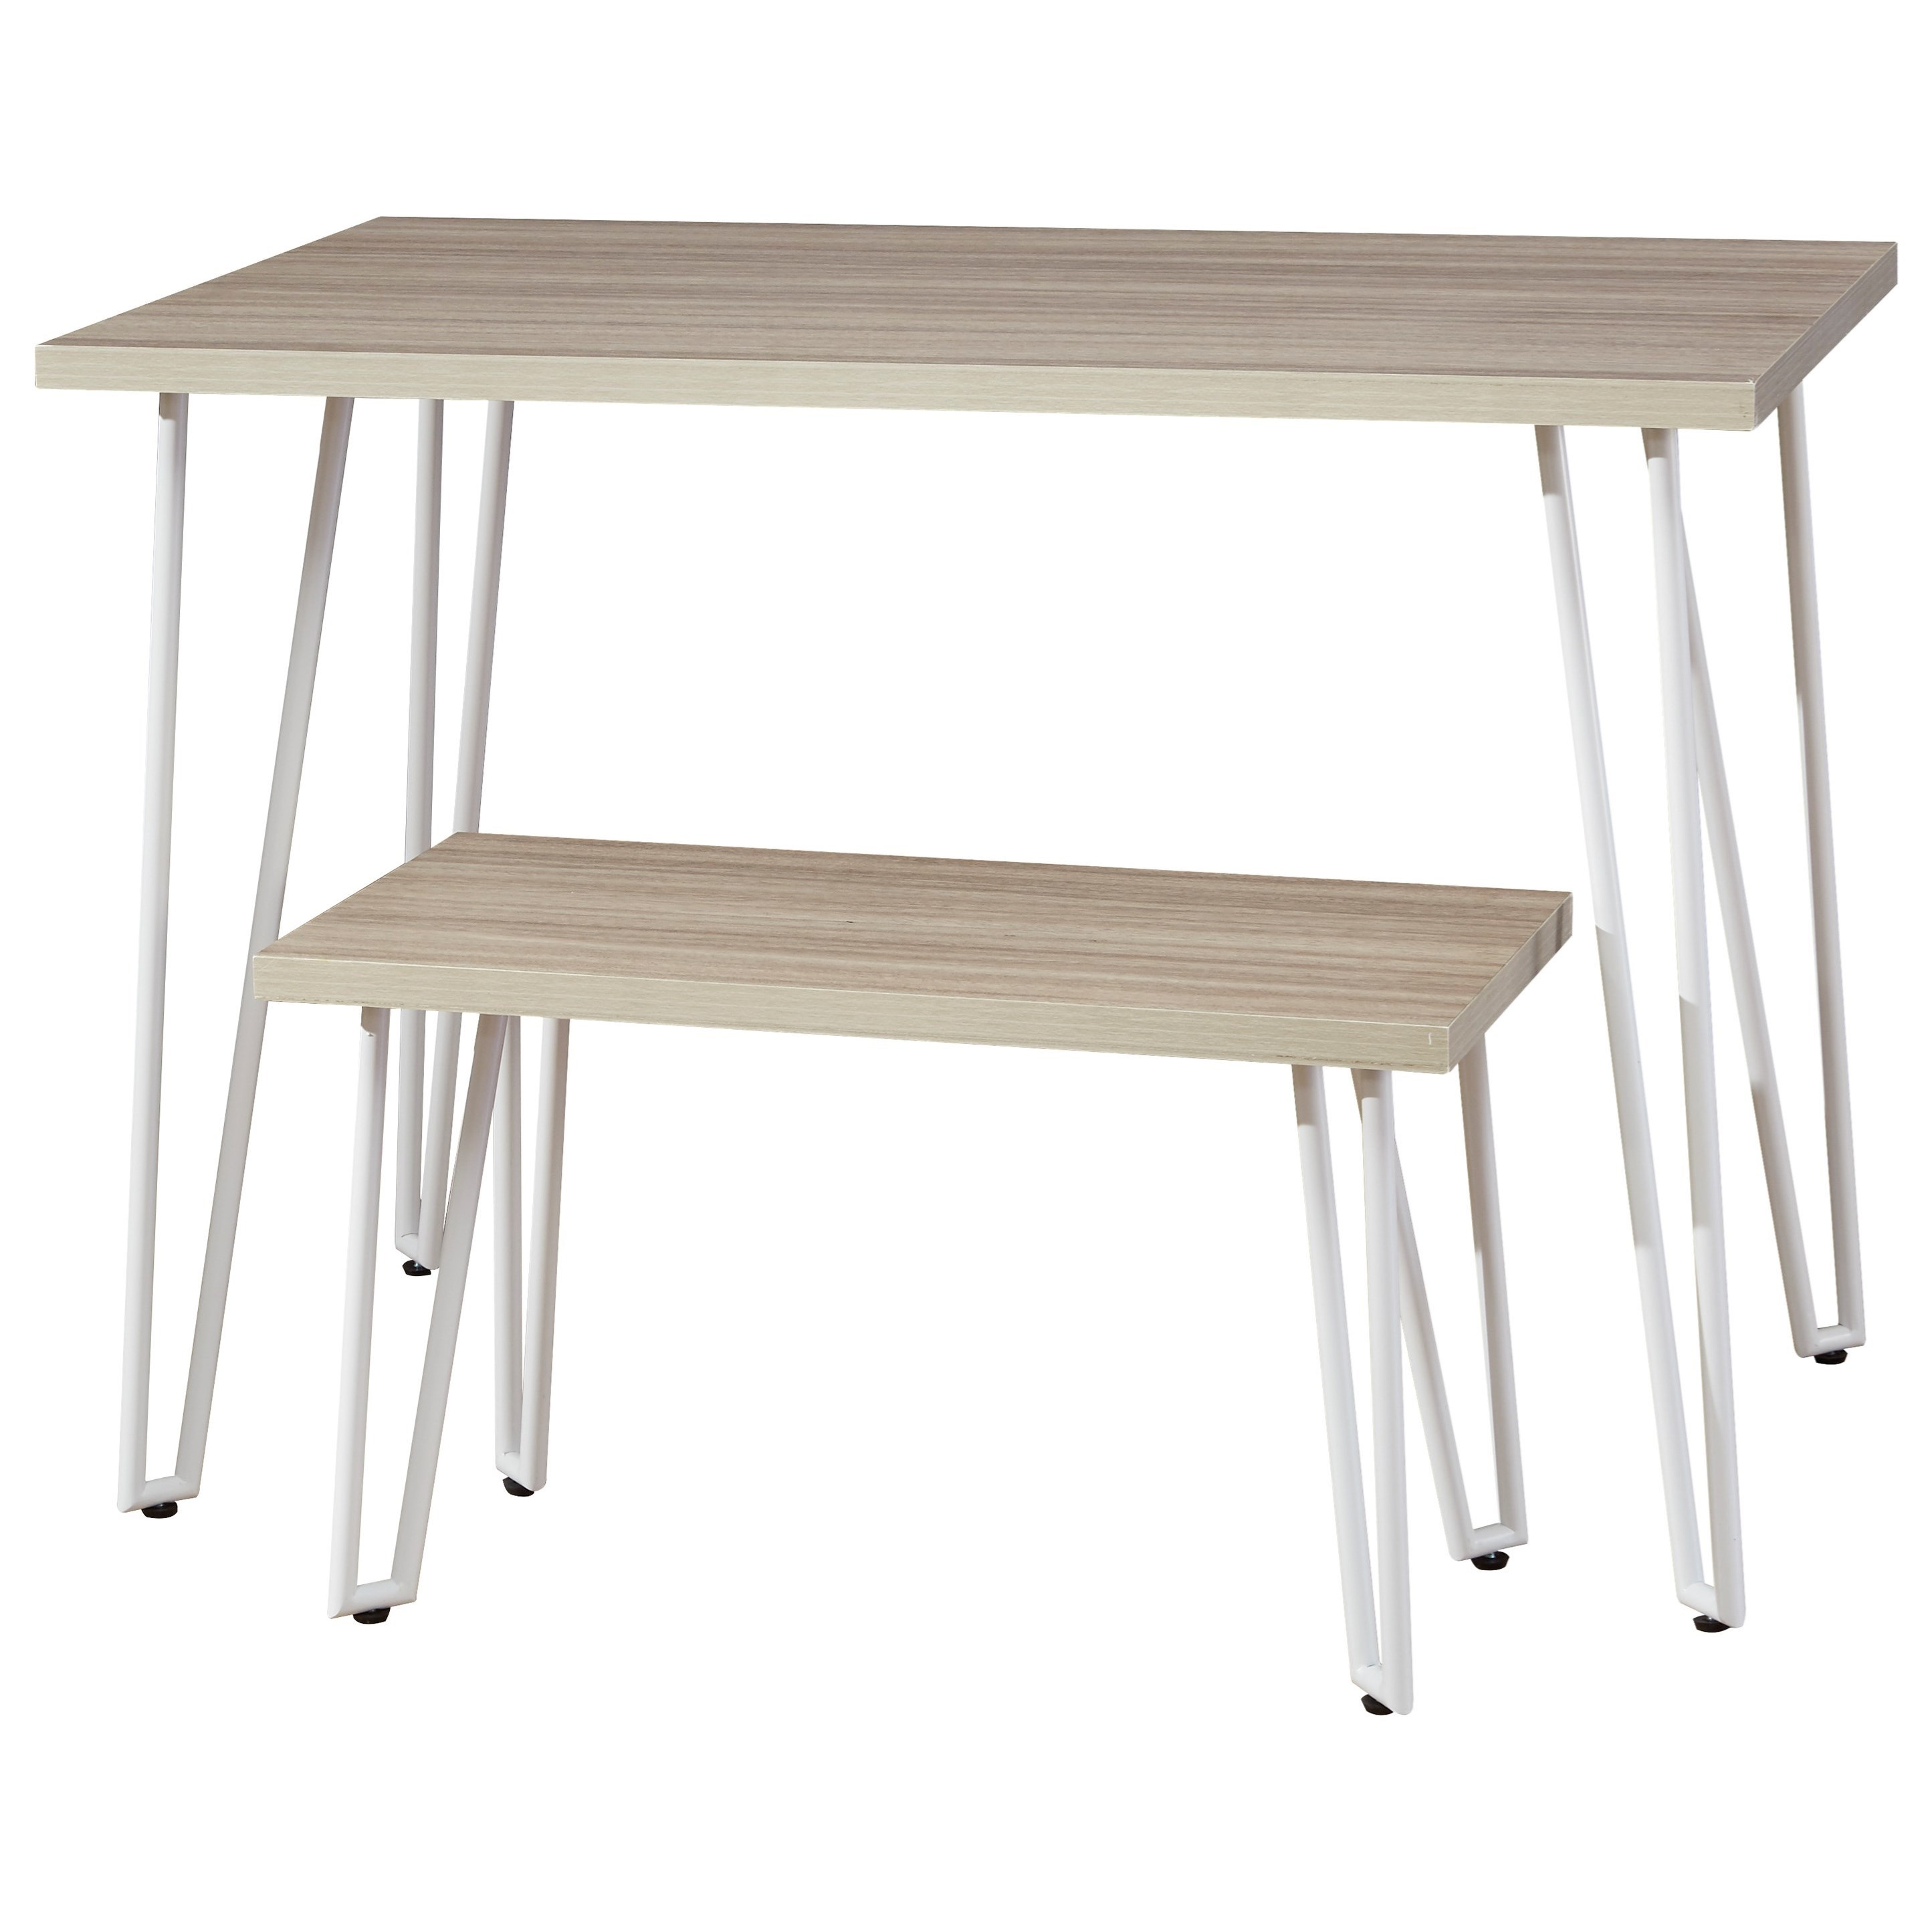 Blariden Desk w/ Bench by Ashley (Signature Design) at Johnny Janosik